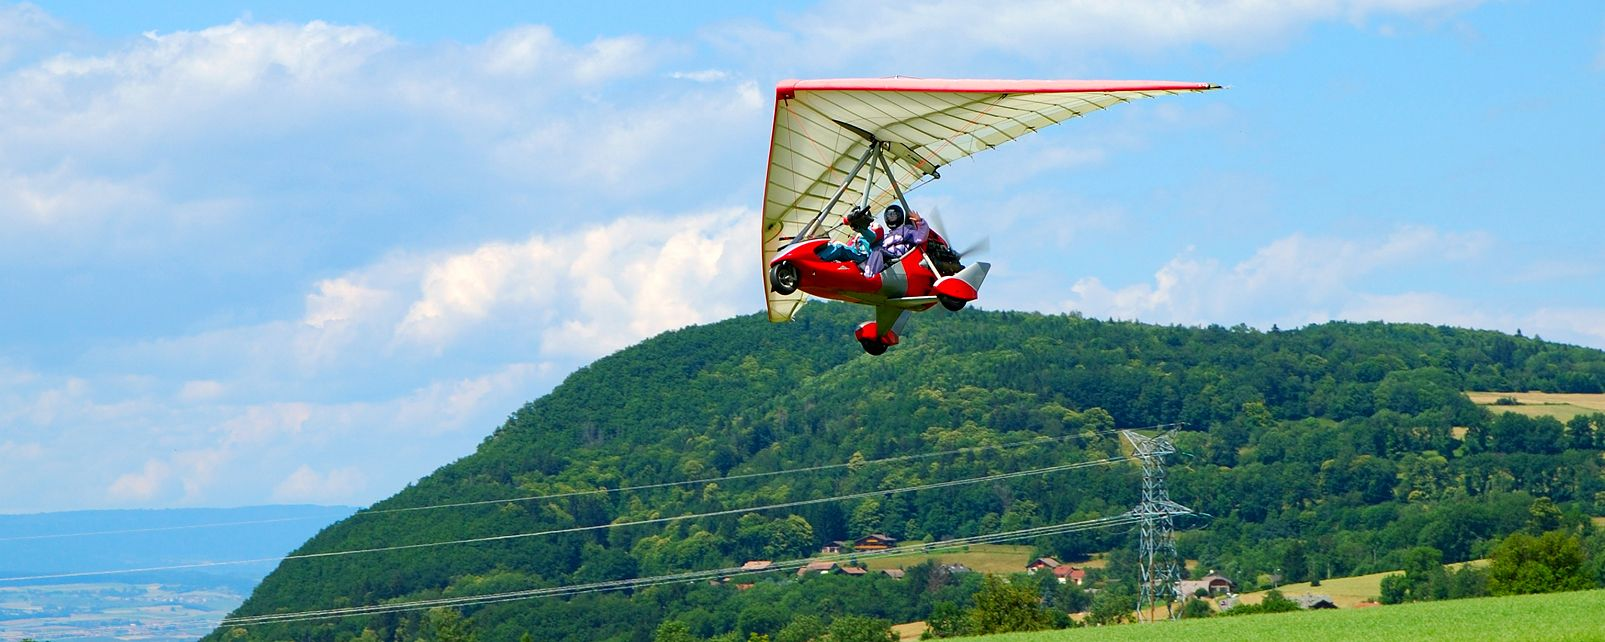 Comité régional ULM PACA (ULM [Ultra-lèger motorisé ? Ultra light motorised gliders] PACA [Provence-Alps-Côtes d'Azur] Regional Committee) , Microlighting in Provence Alpes Cotes d'Azur , France